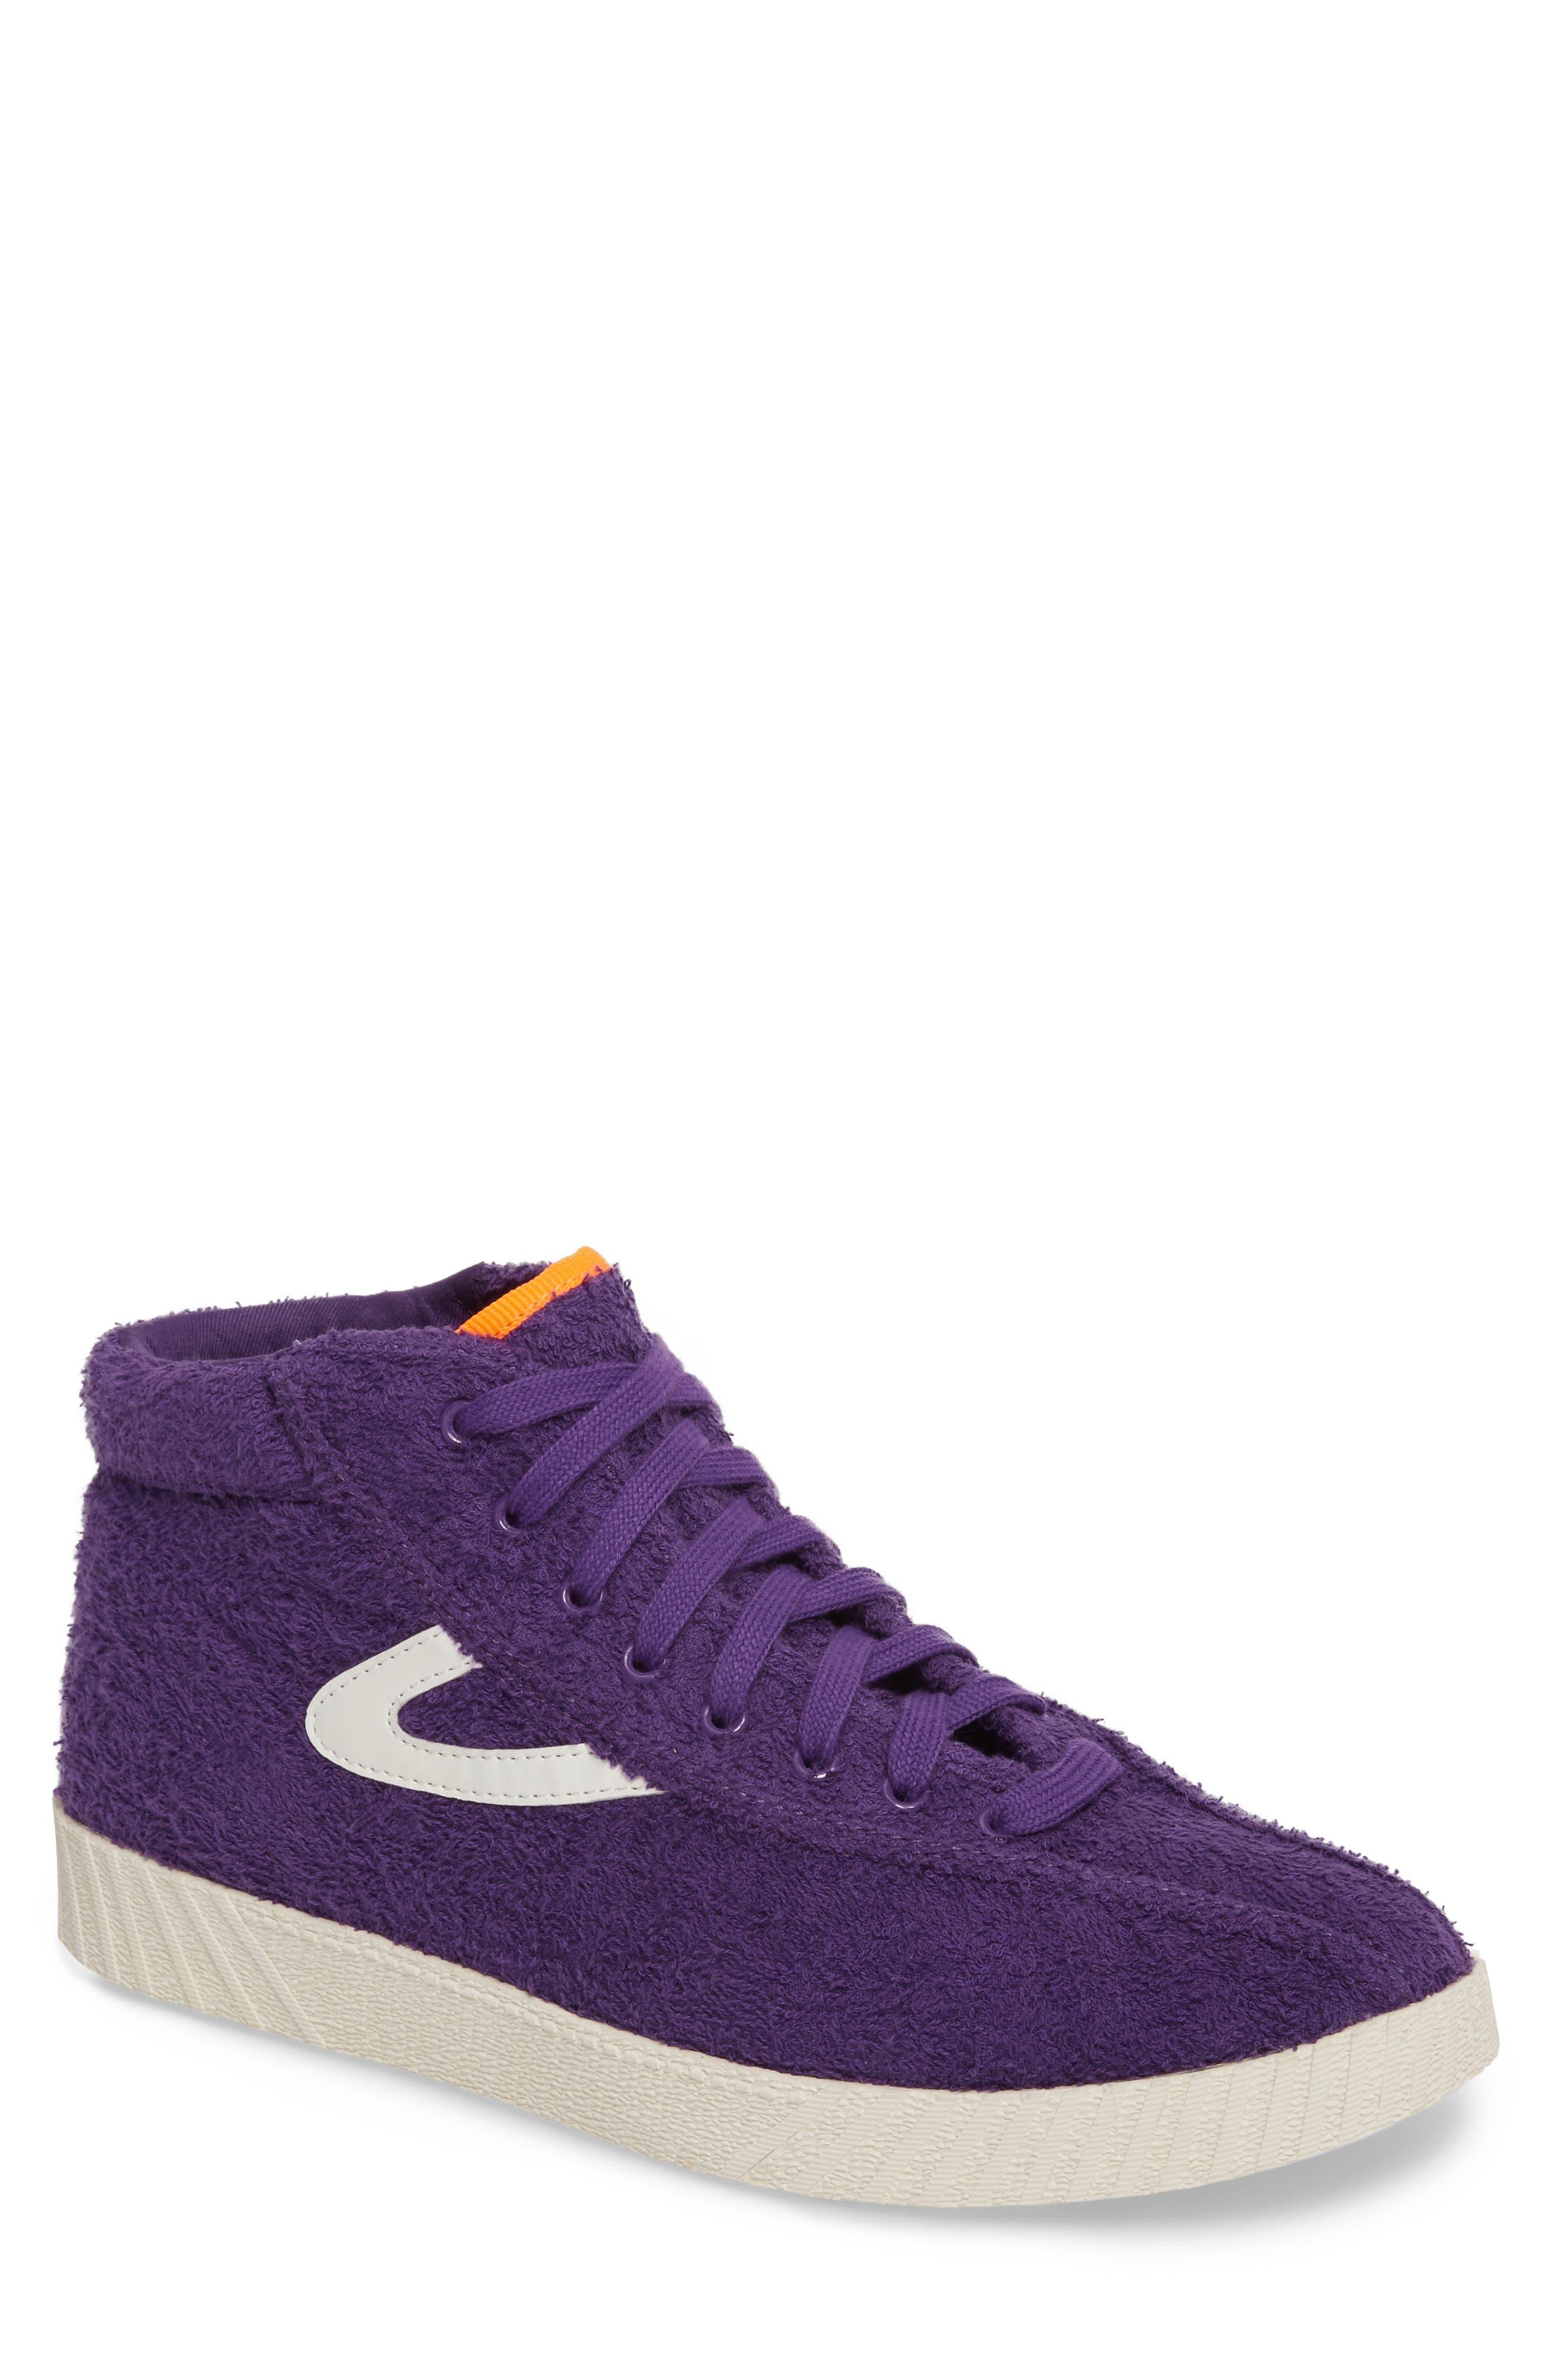 Andre 3000 Nylite High Top Sneaker,                             Main thumbnail 1, color,                             Vibrant Purple/ Vintage White